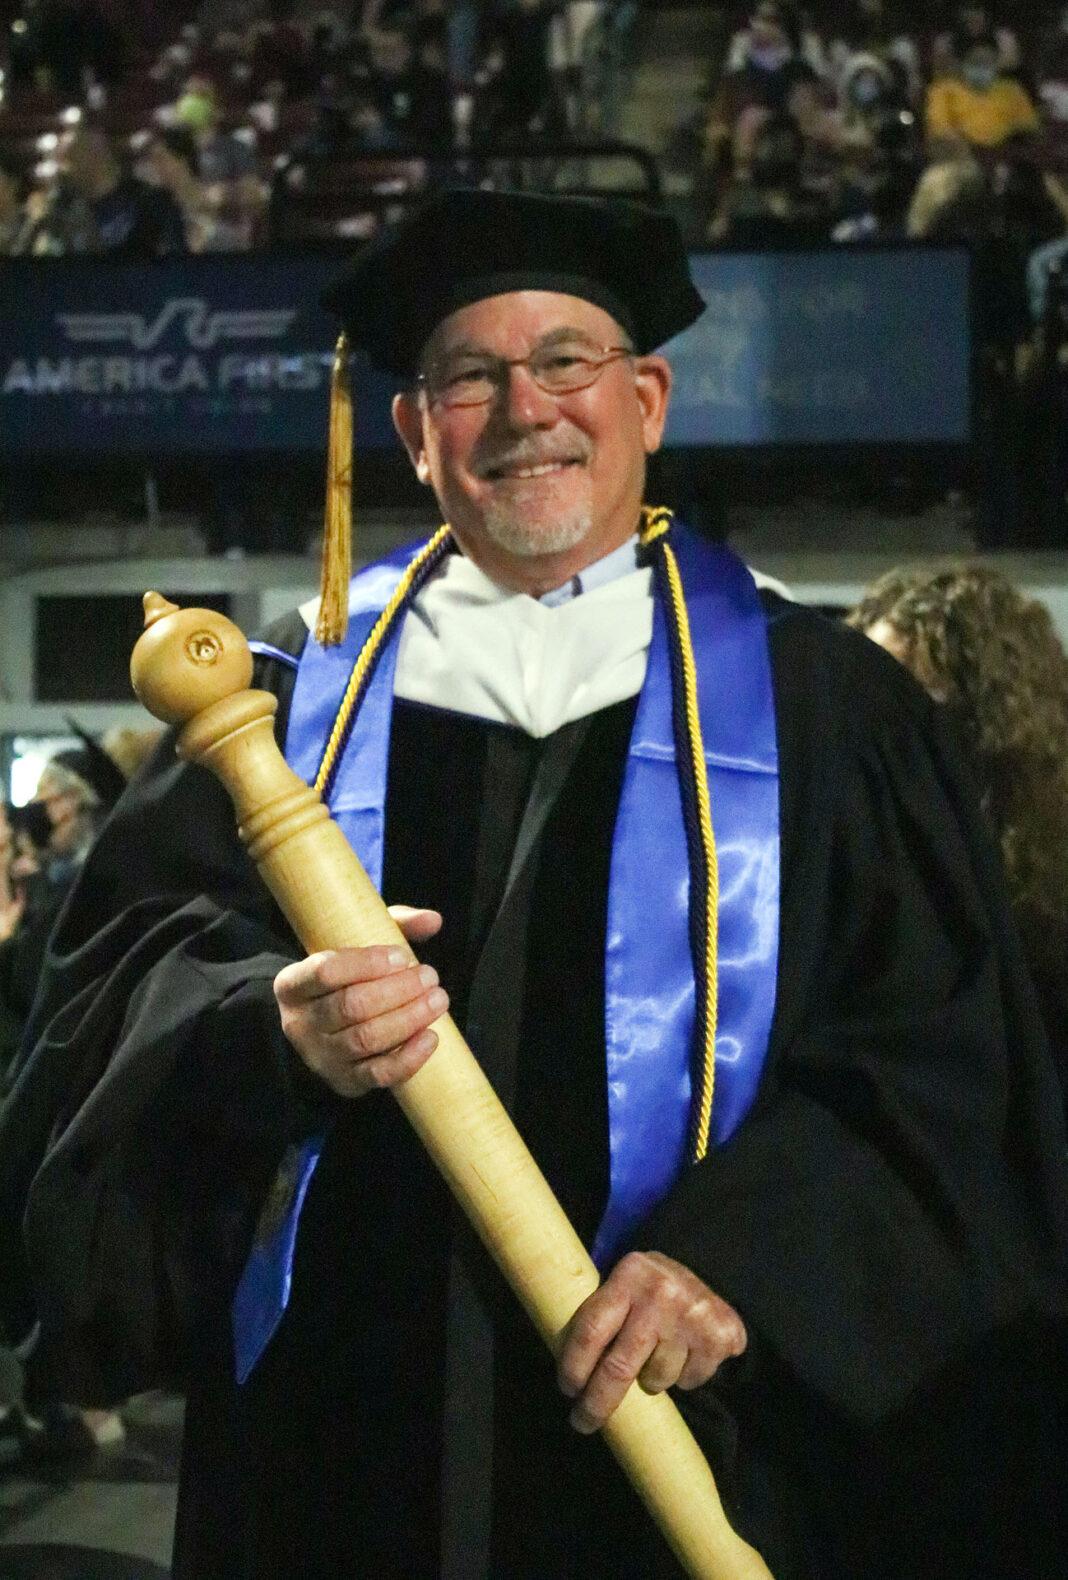 Brett Baird holds a ceremonial mace